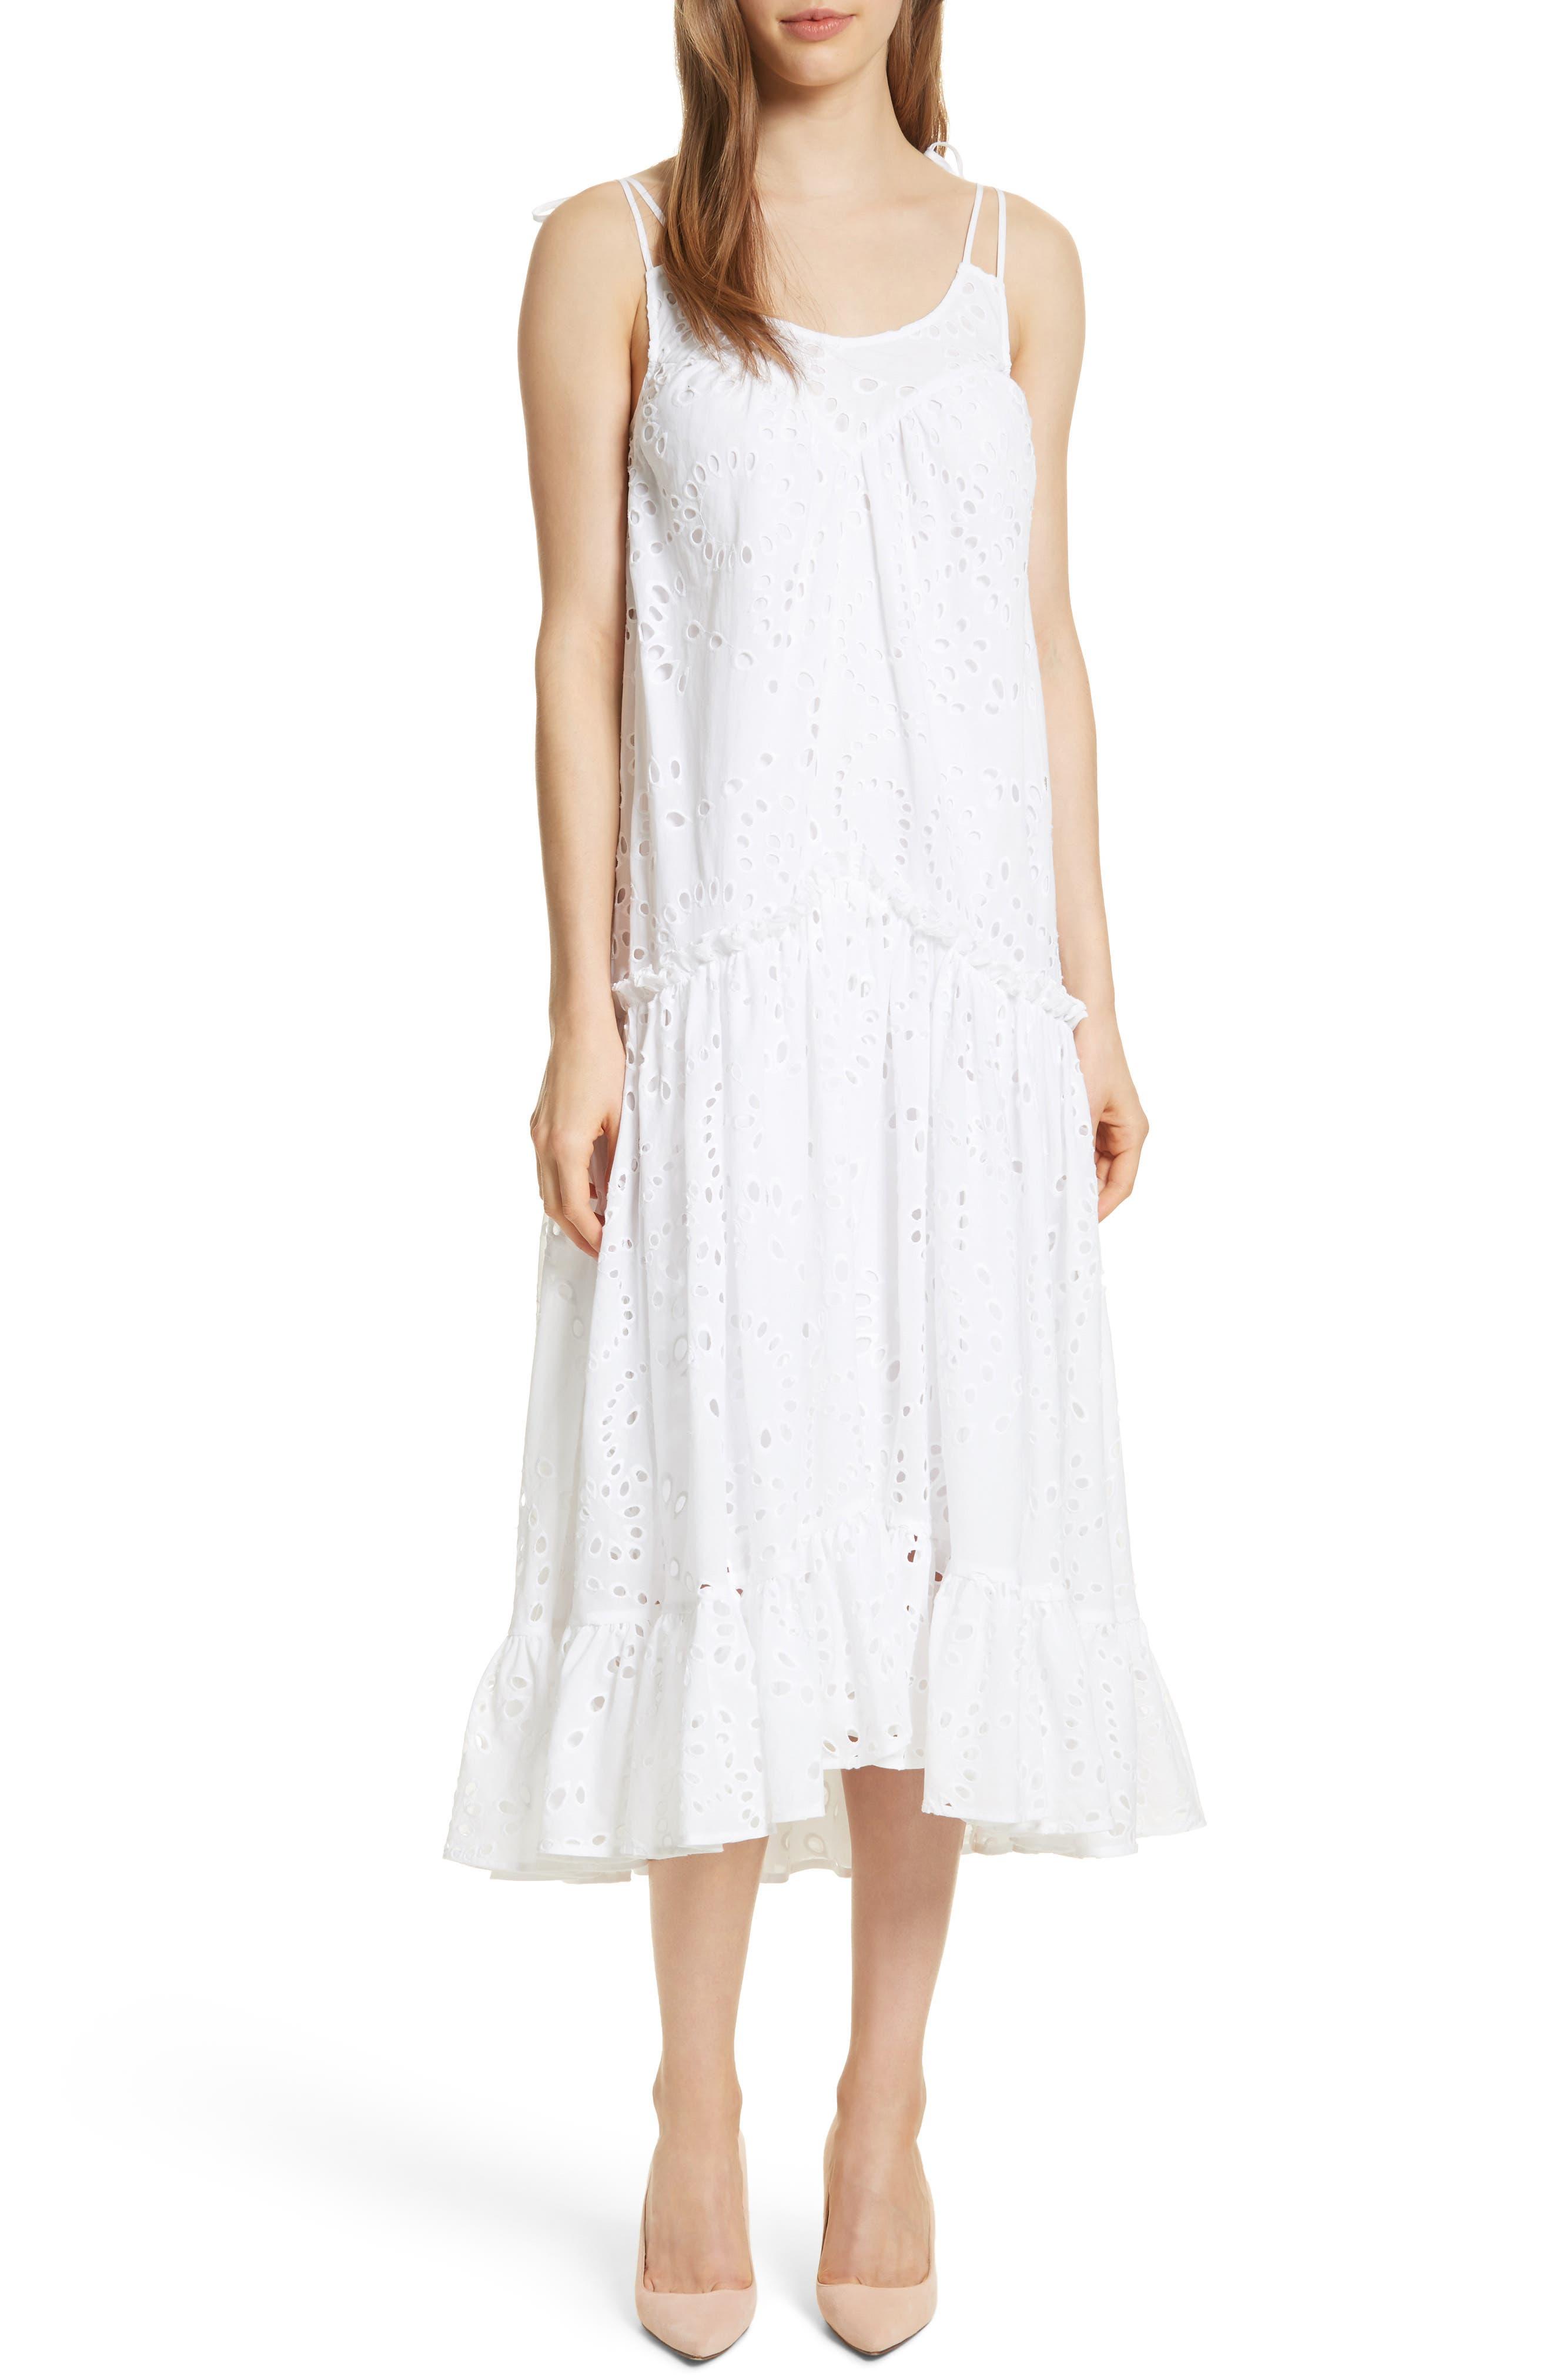 Prose & Poetry Kerr Eyelet Peasant Midi Dress,                             Main thumbnail 1, color,                             Cloud White